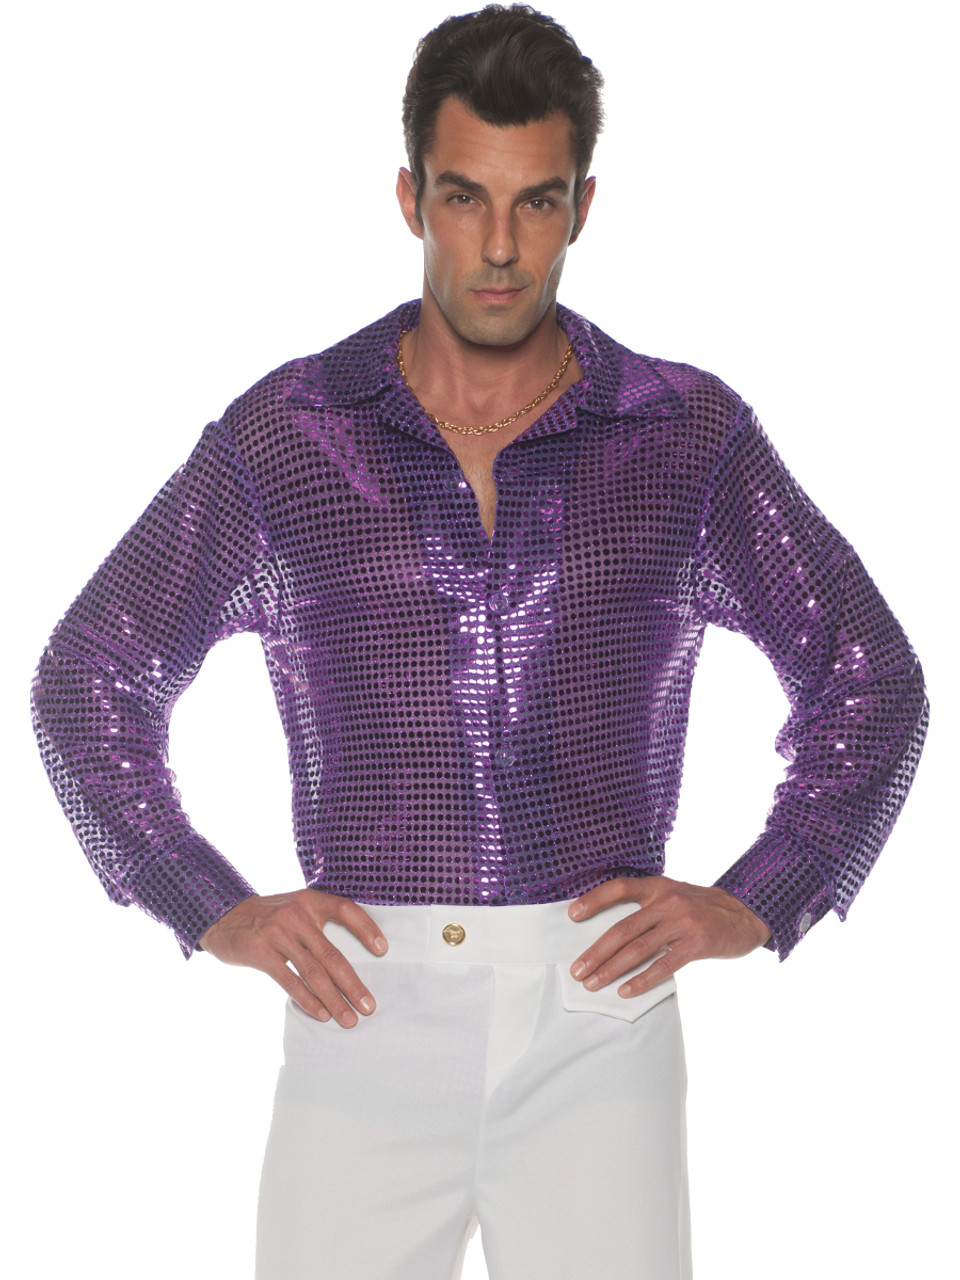 7a7b4a22 Men's 70s Purple Sequin Disco Costume Shirt